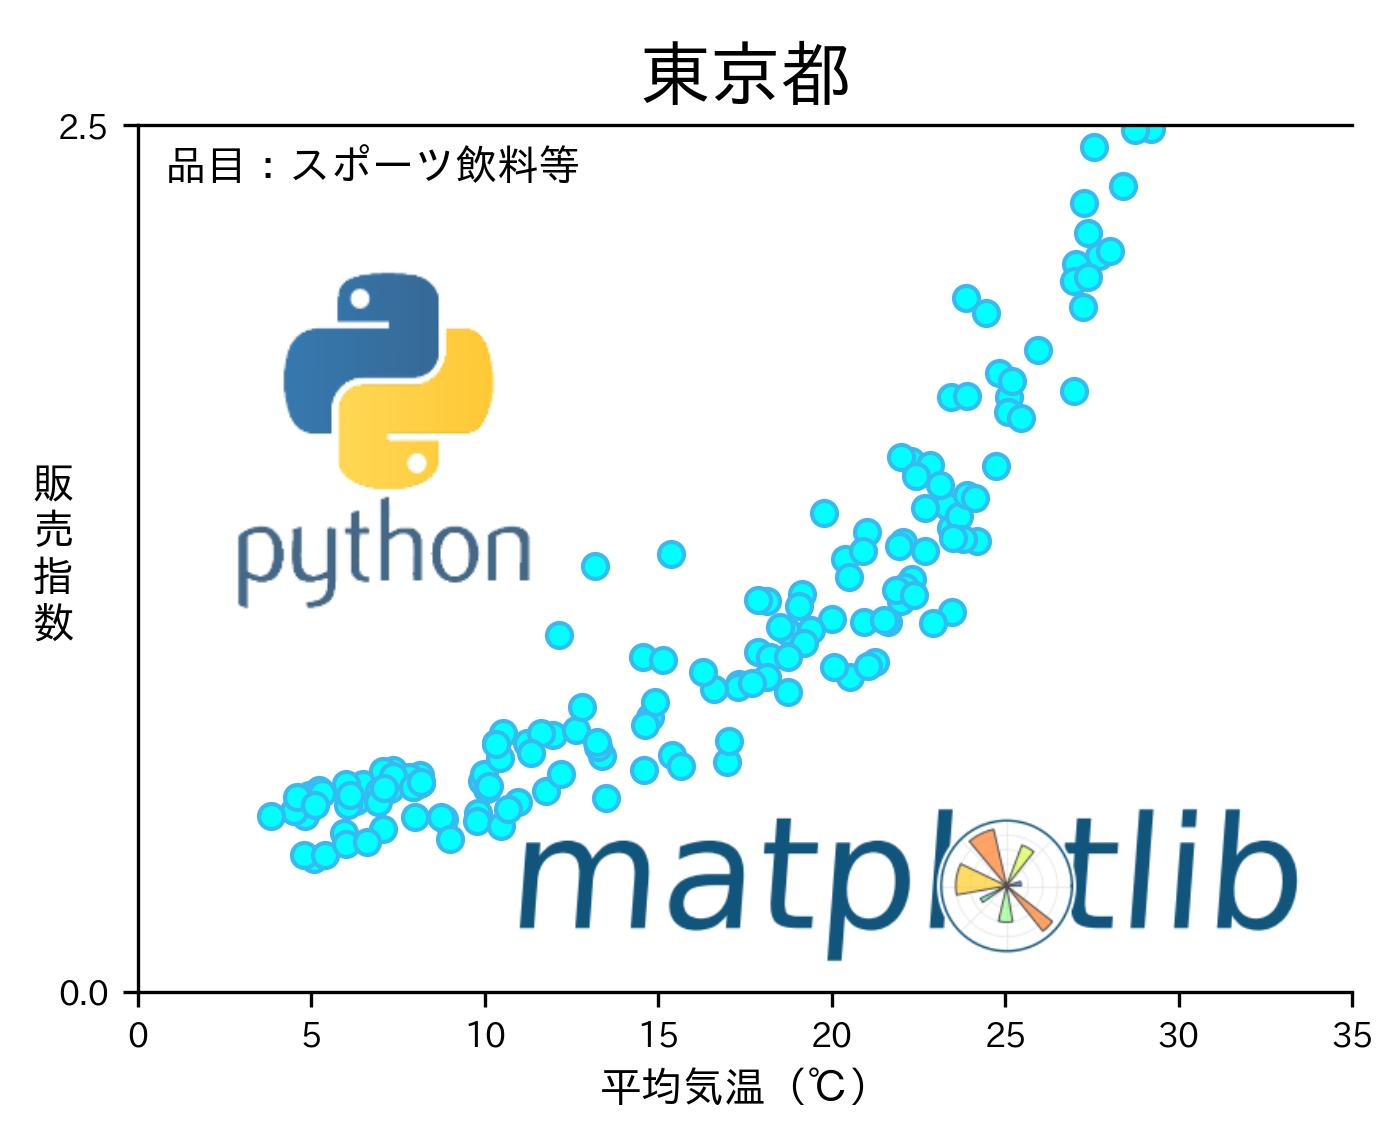 Pythonで散布図を簡単に作成する方法【Matplotlib】